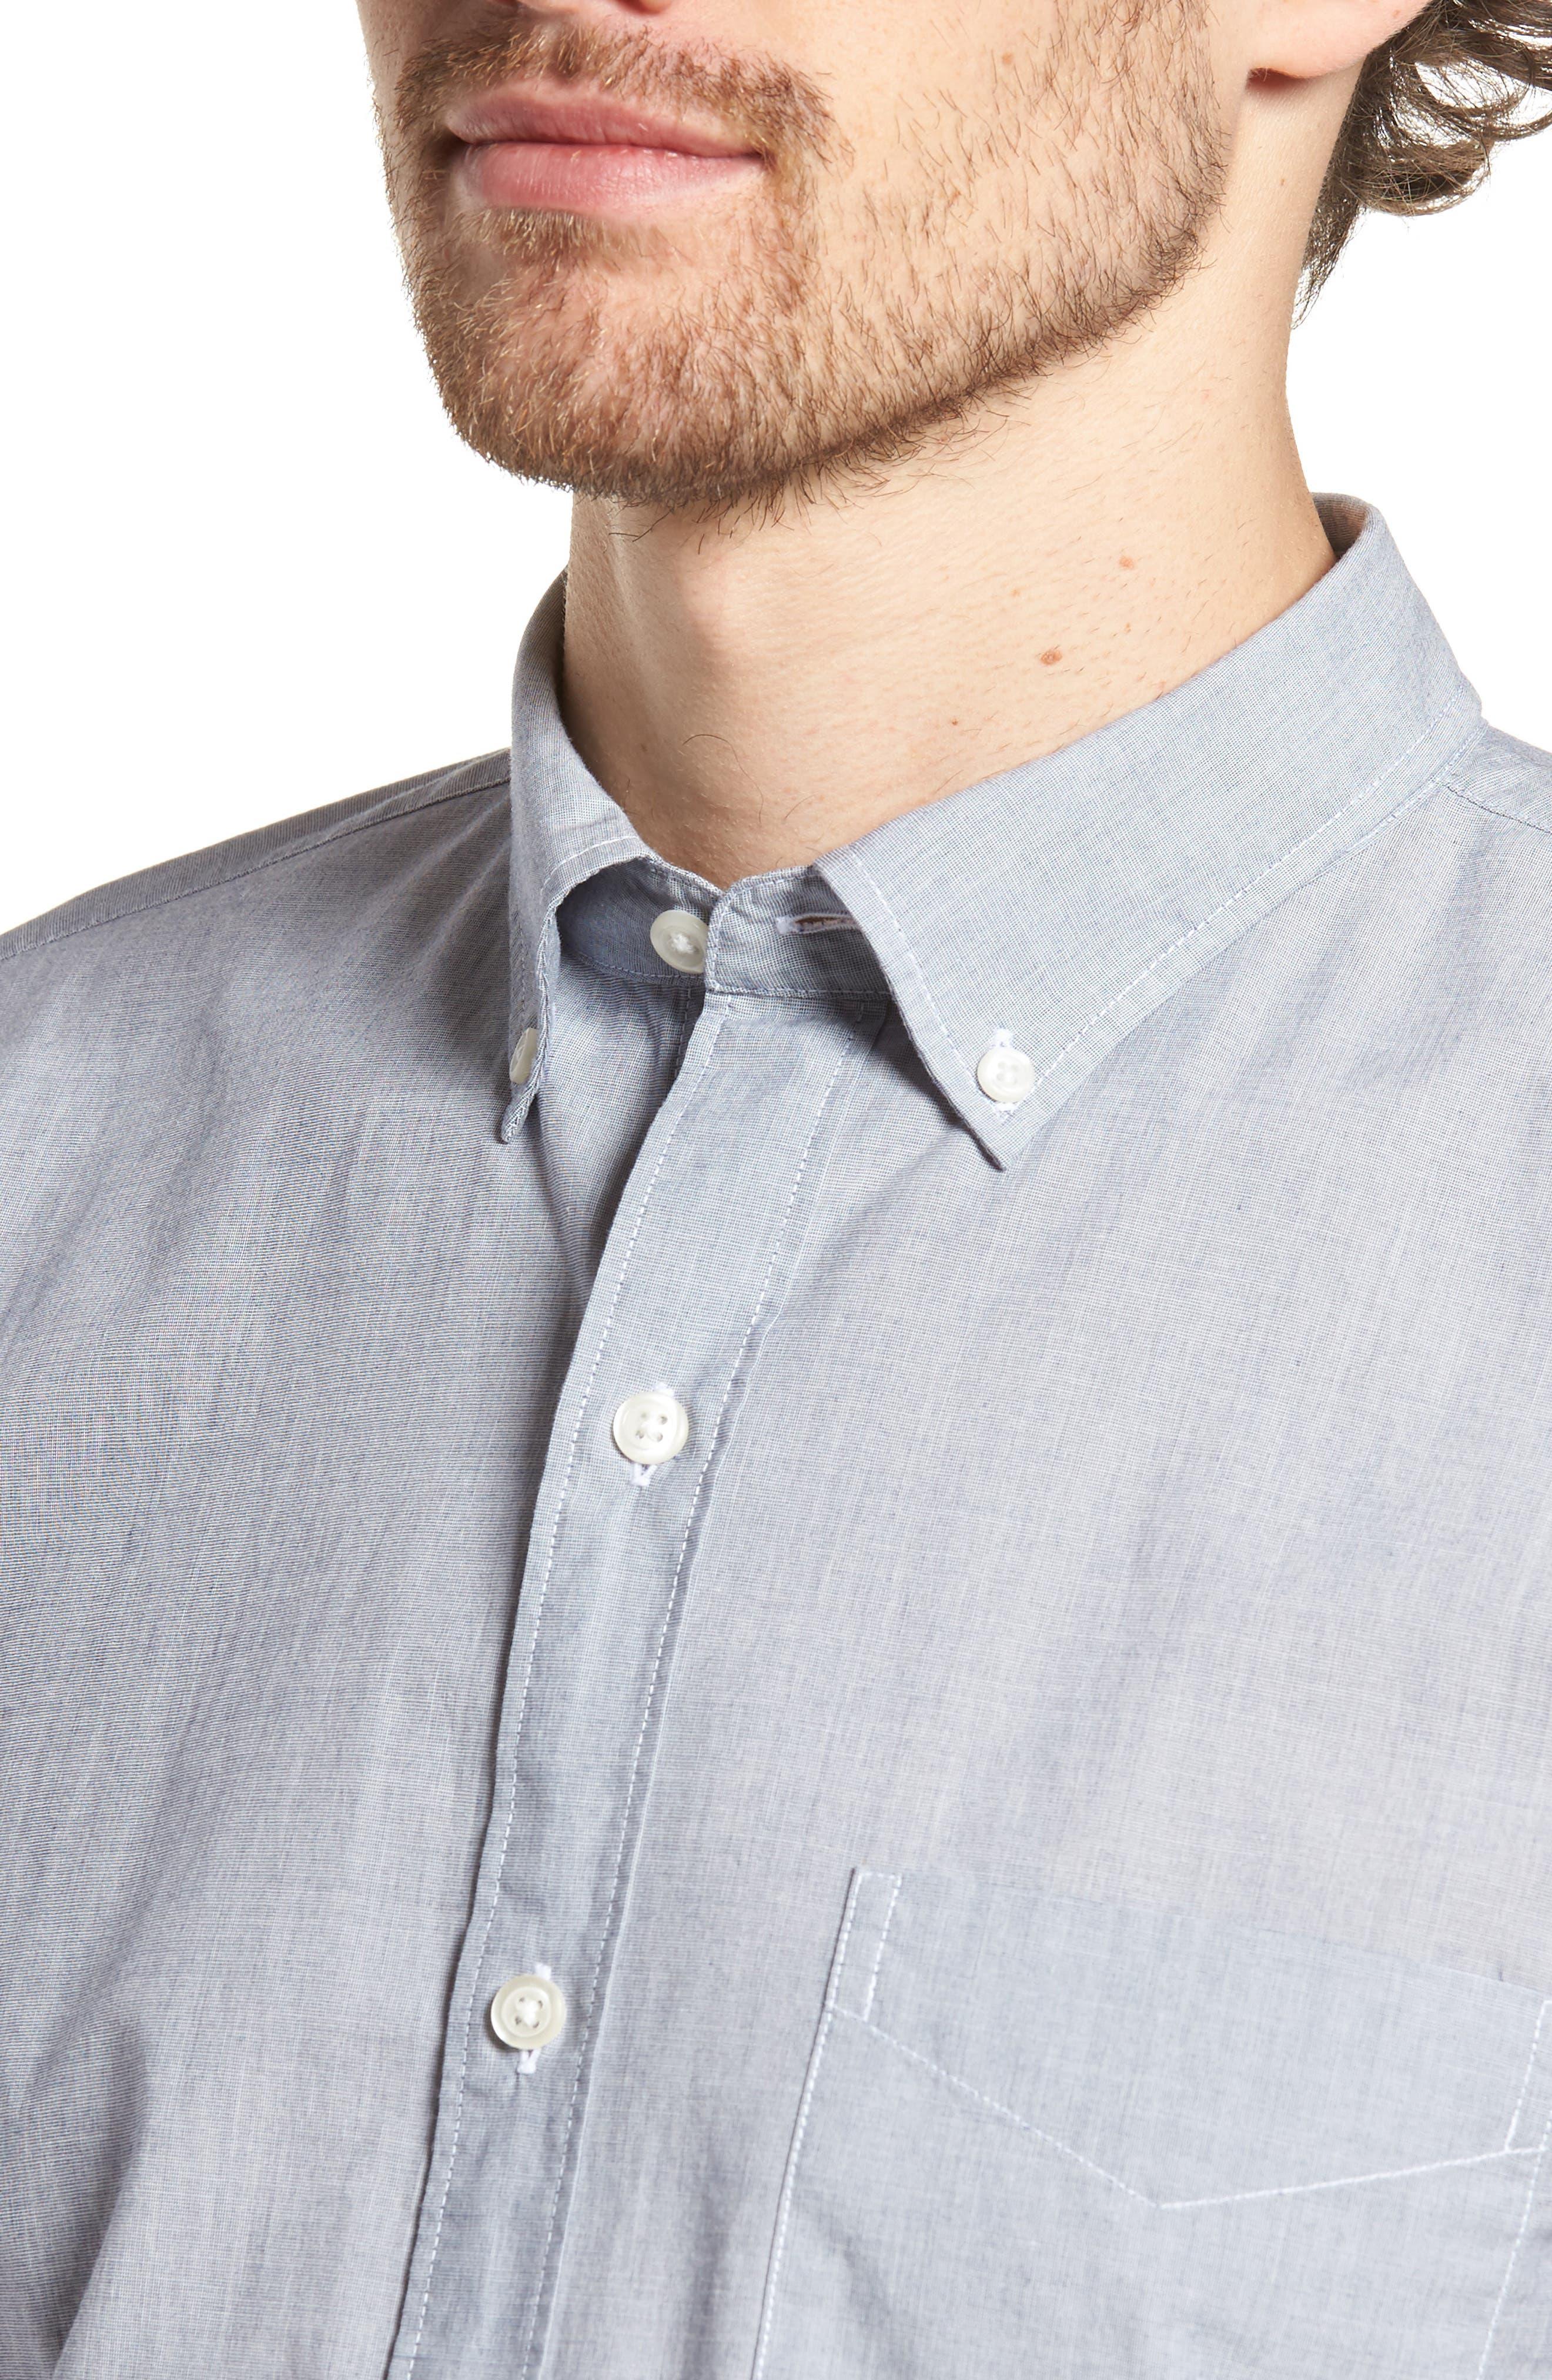 Summerweight Slim Fit Sport Shirt,                             Alternate thumbnail 4, color,                             End On End Solid - Blue Depths